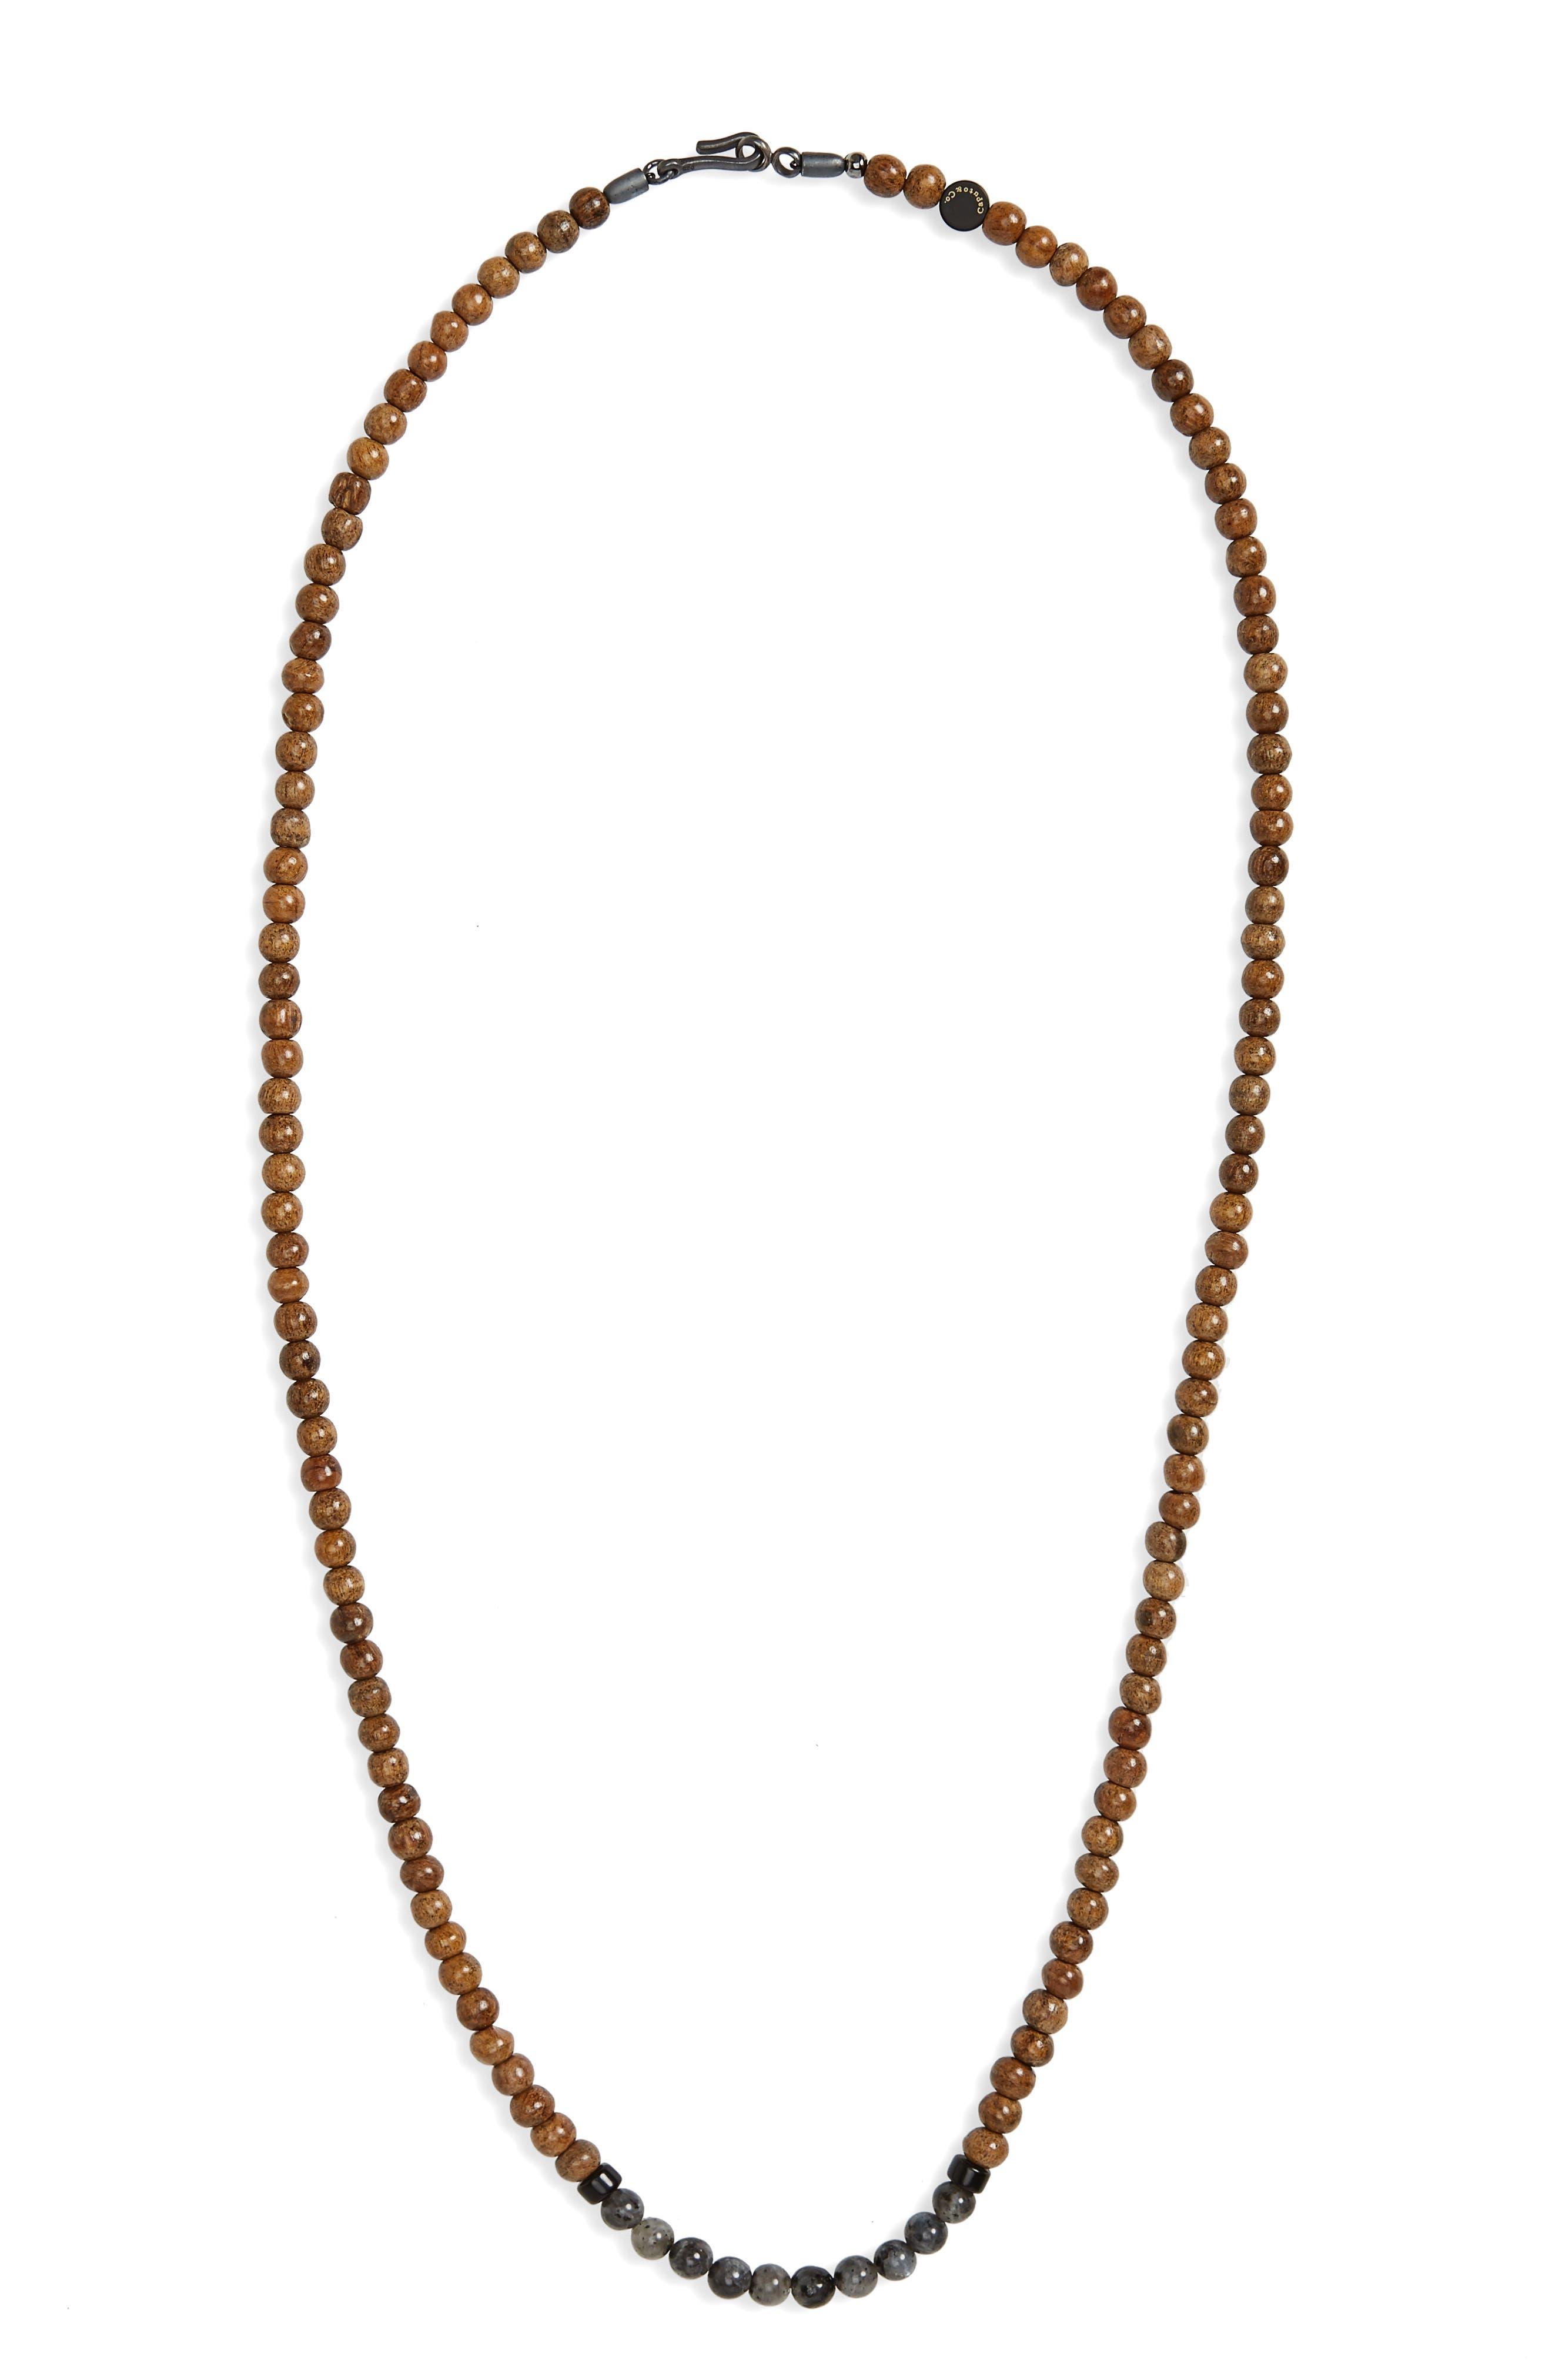 Ubud Stone Bead Necklace,                             Main thumbnail 1, color,                             Black Labradorite